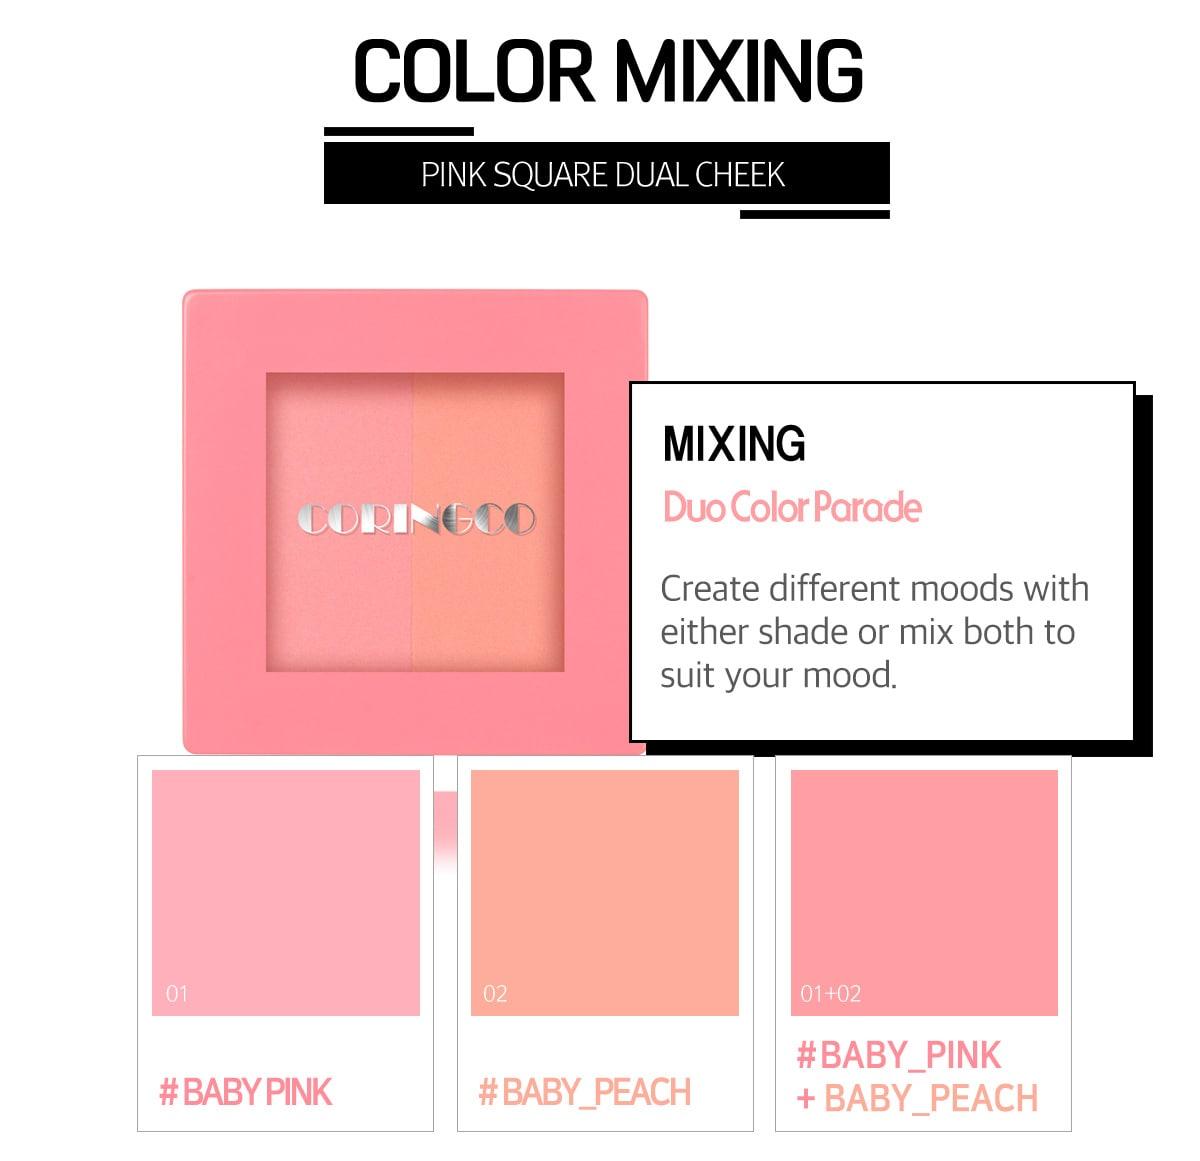 Pink Square Dual Cheek - Colors